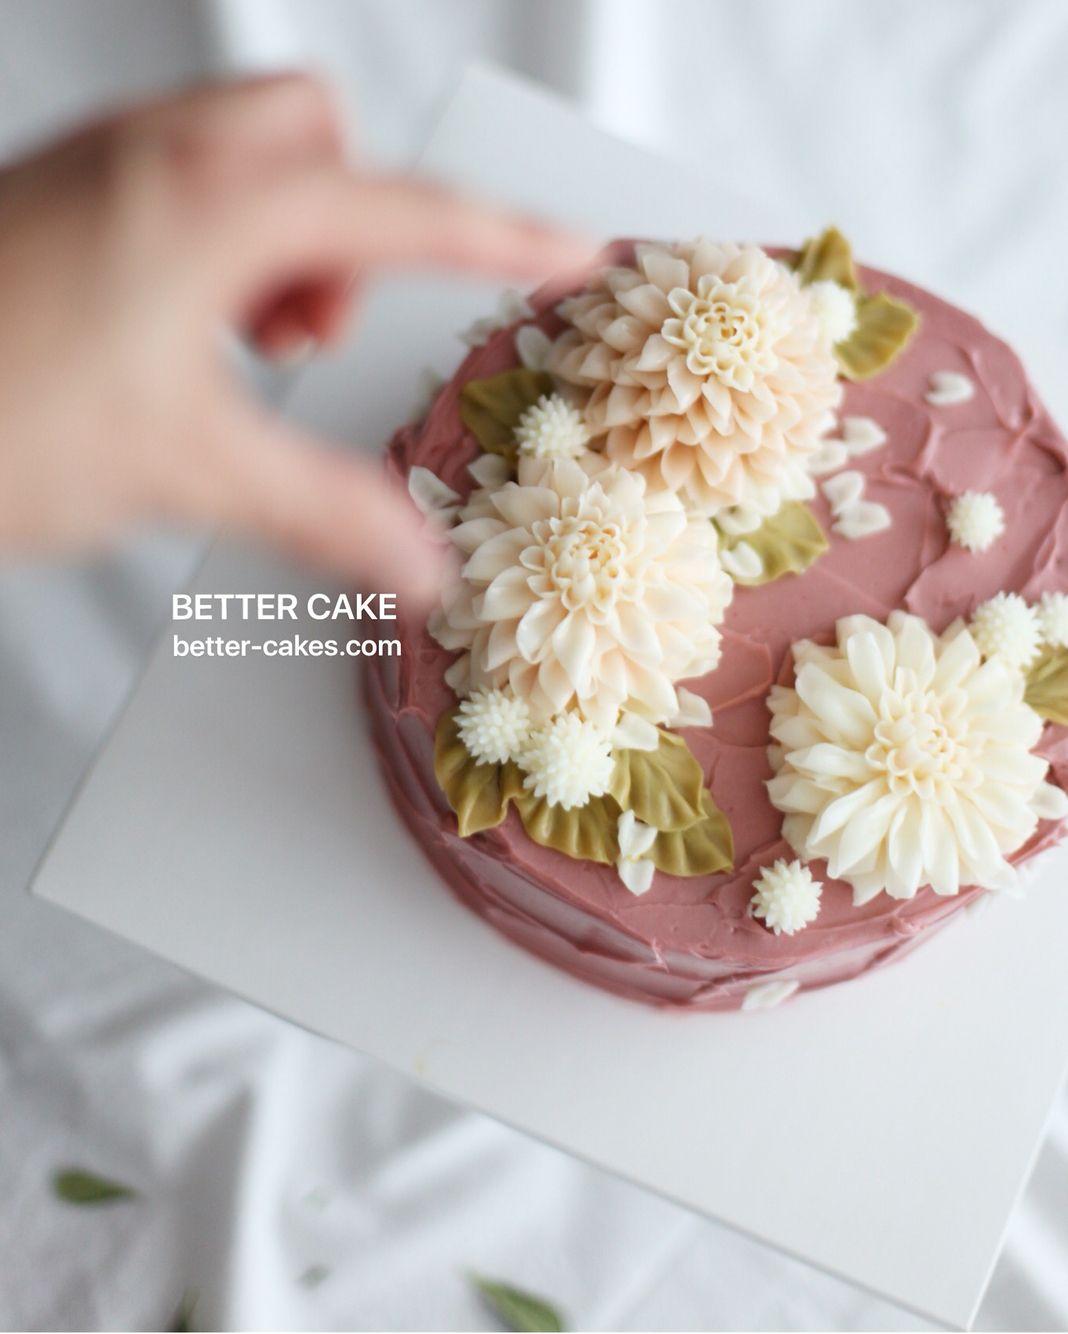 . Done by my / Dahlia flower cake  . Mailbettercakes@naver.com Linebetter_cake FacebookBetter Cake Kakaotalkleesumin222  #buttercream#cake#베이킹#baking#bettercake#like#버터크림케익#베러케이크#koreanbuttercream#flowers#꽃#sweet#플라워케이크#foodporn#birthday #beanpaste#디저트#bettercake#dessert#버터크림플라워케익#follow#food#koreancake#beautiful#flowerstagram#instacake#공방#꽃스타그램#베이킹클래스#instafood#flowercake